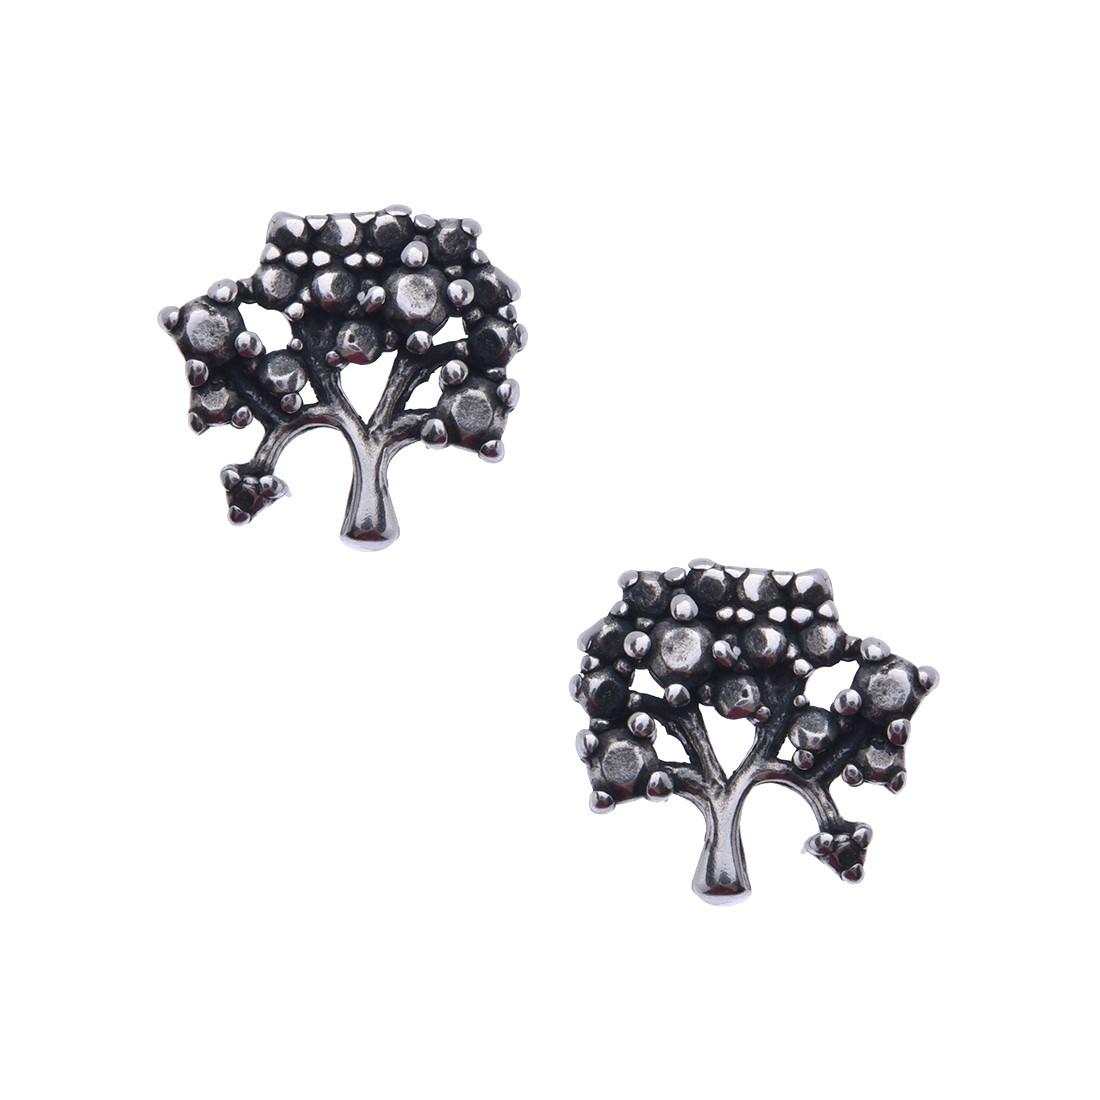 Brinco Árvore da Vida Marcassita Prata 925 e Marcassita